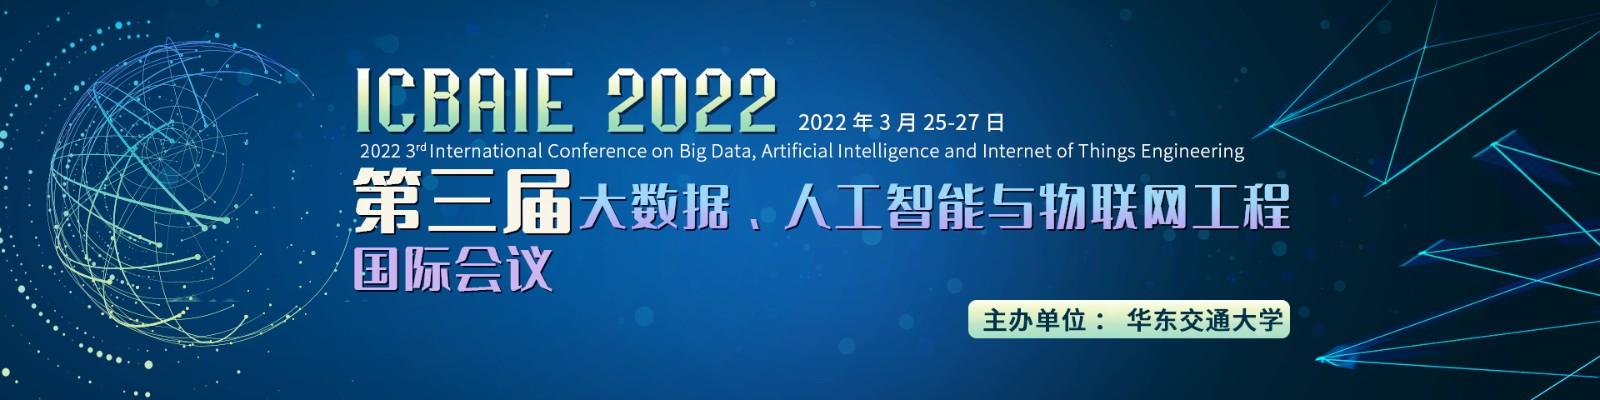 3月-ICBAIE2022-会议中文banner-张寅婕-20210804.jpg